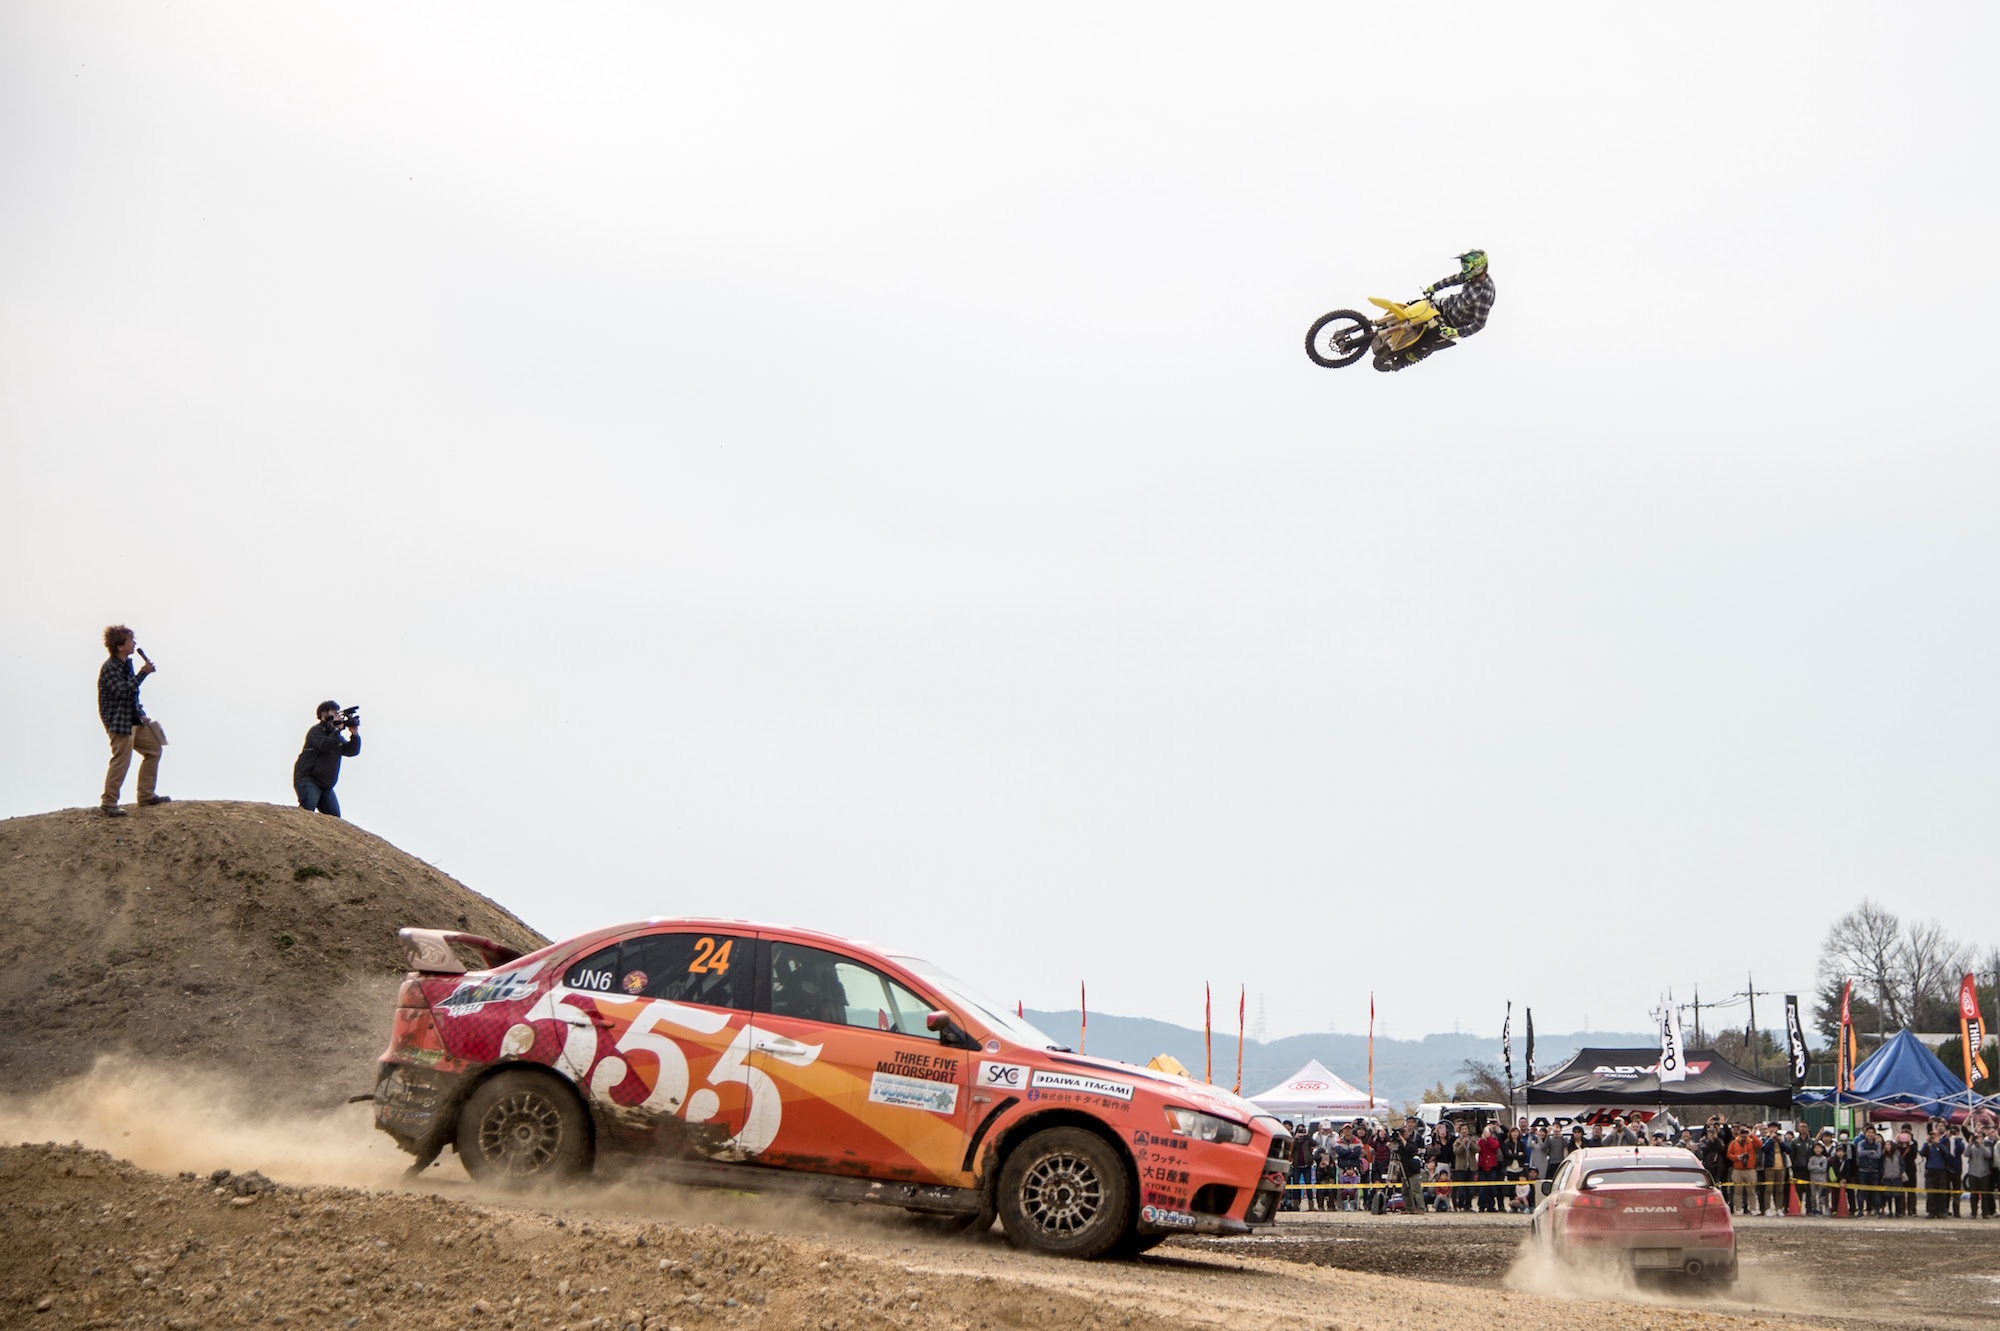 Joyo Super Jump Extreme 2017 by Motorsports